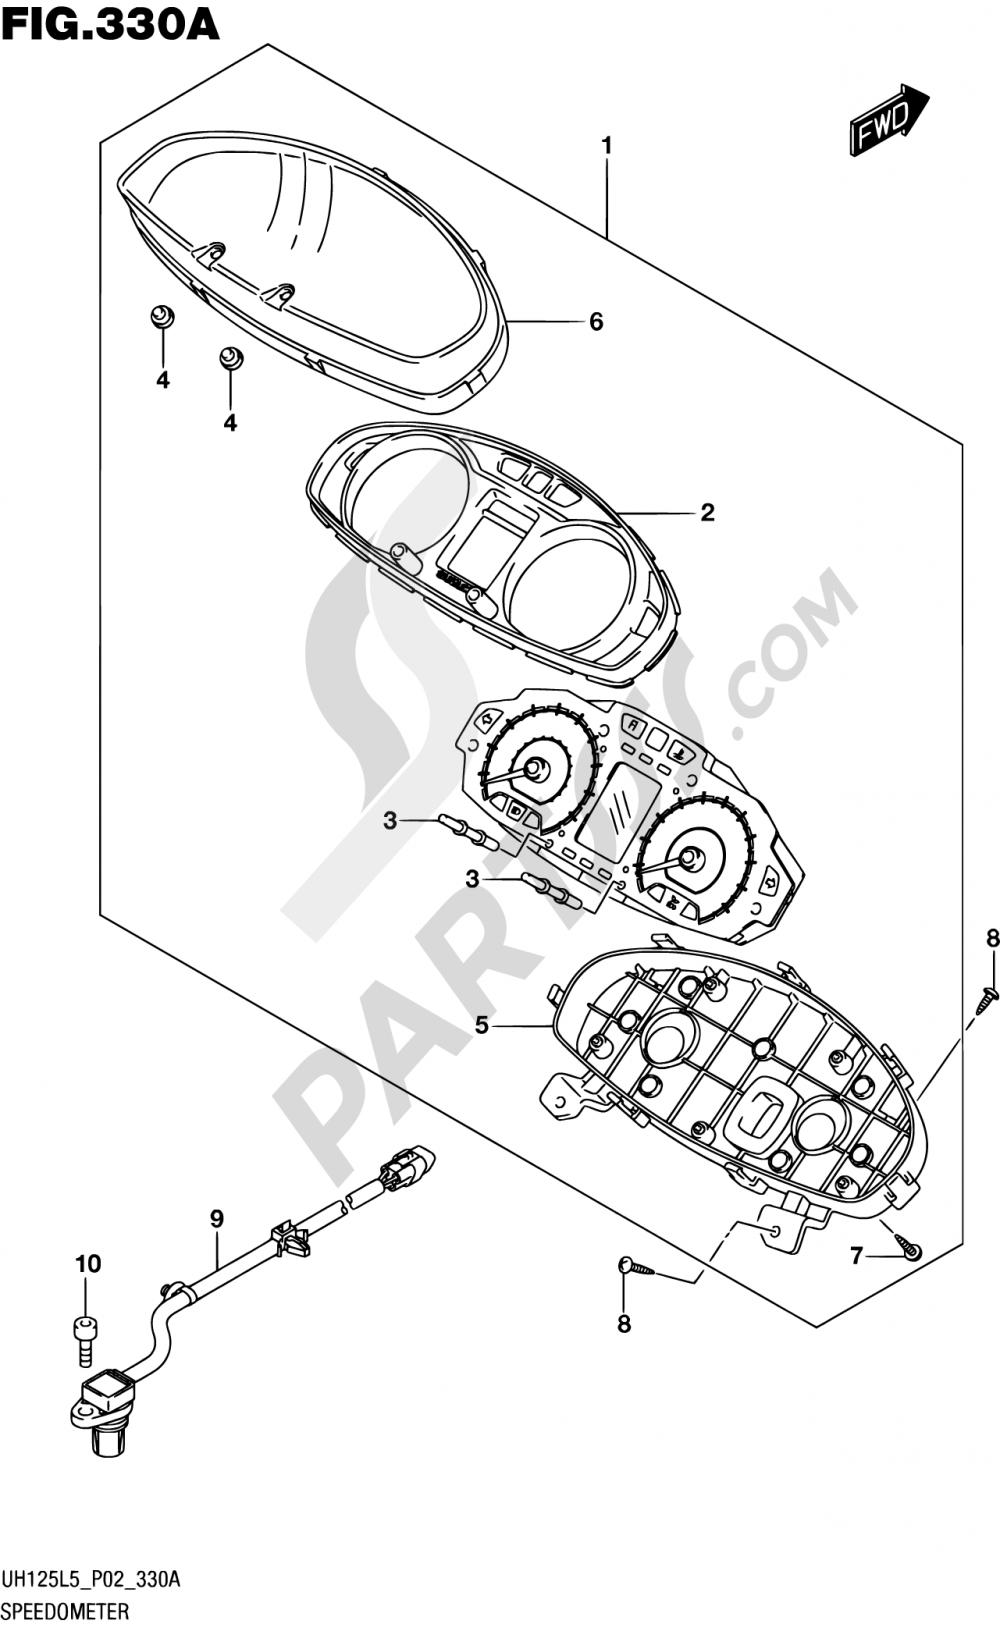 330A - SPEEDOMETER (UH125L5 P02) Suzuki BURGMAN UH125A 2015